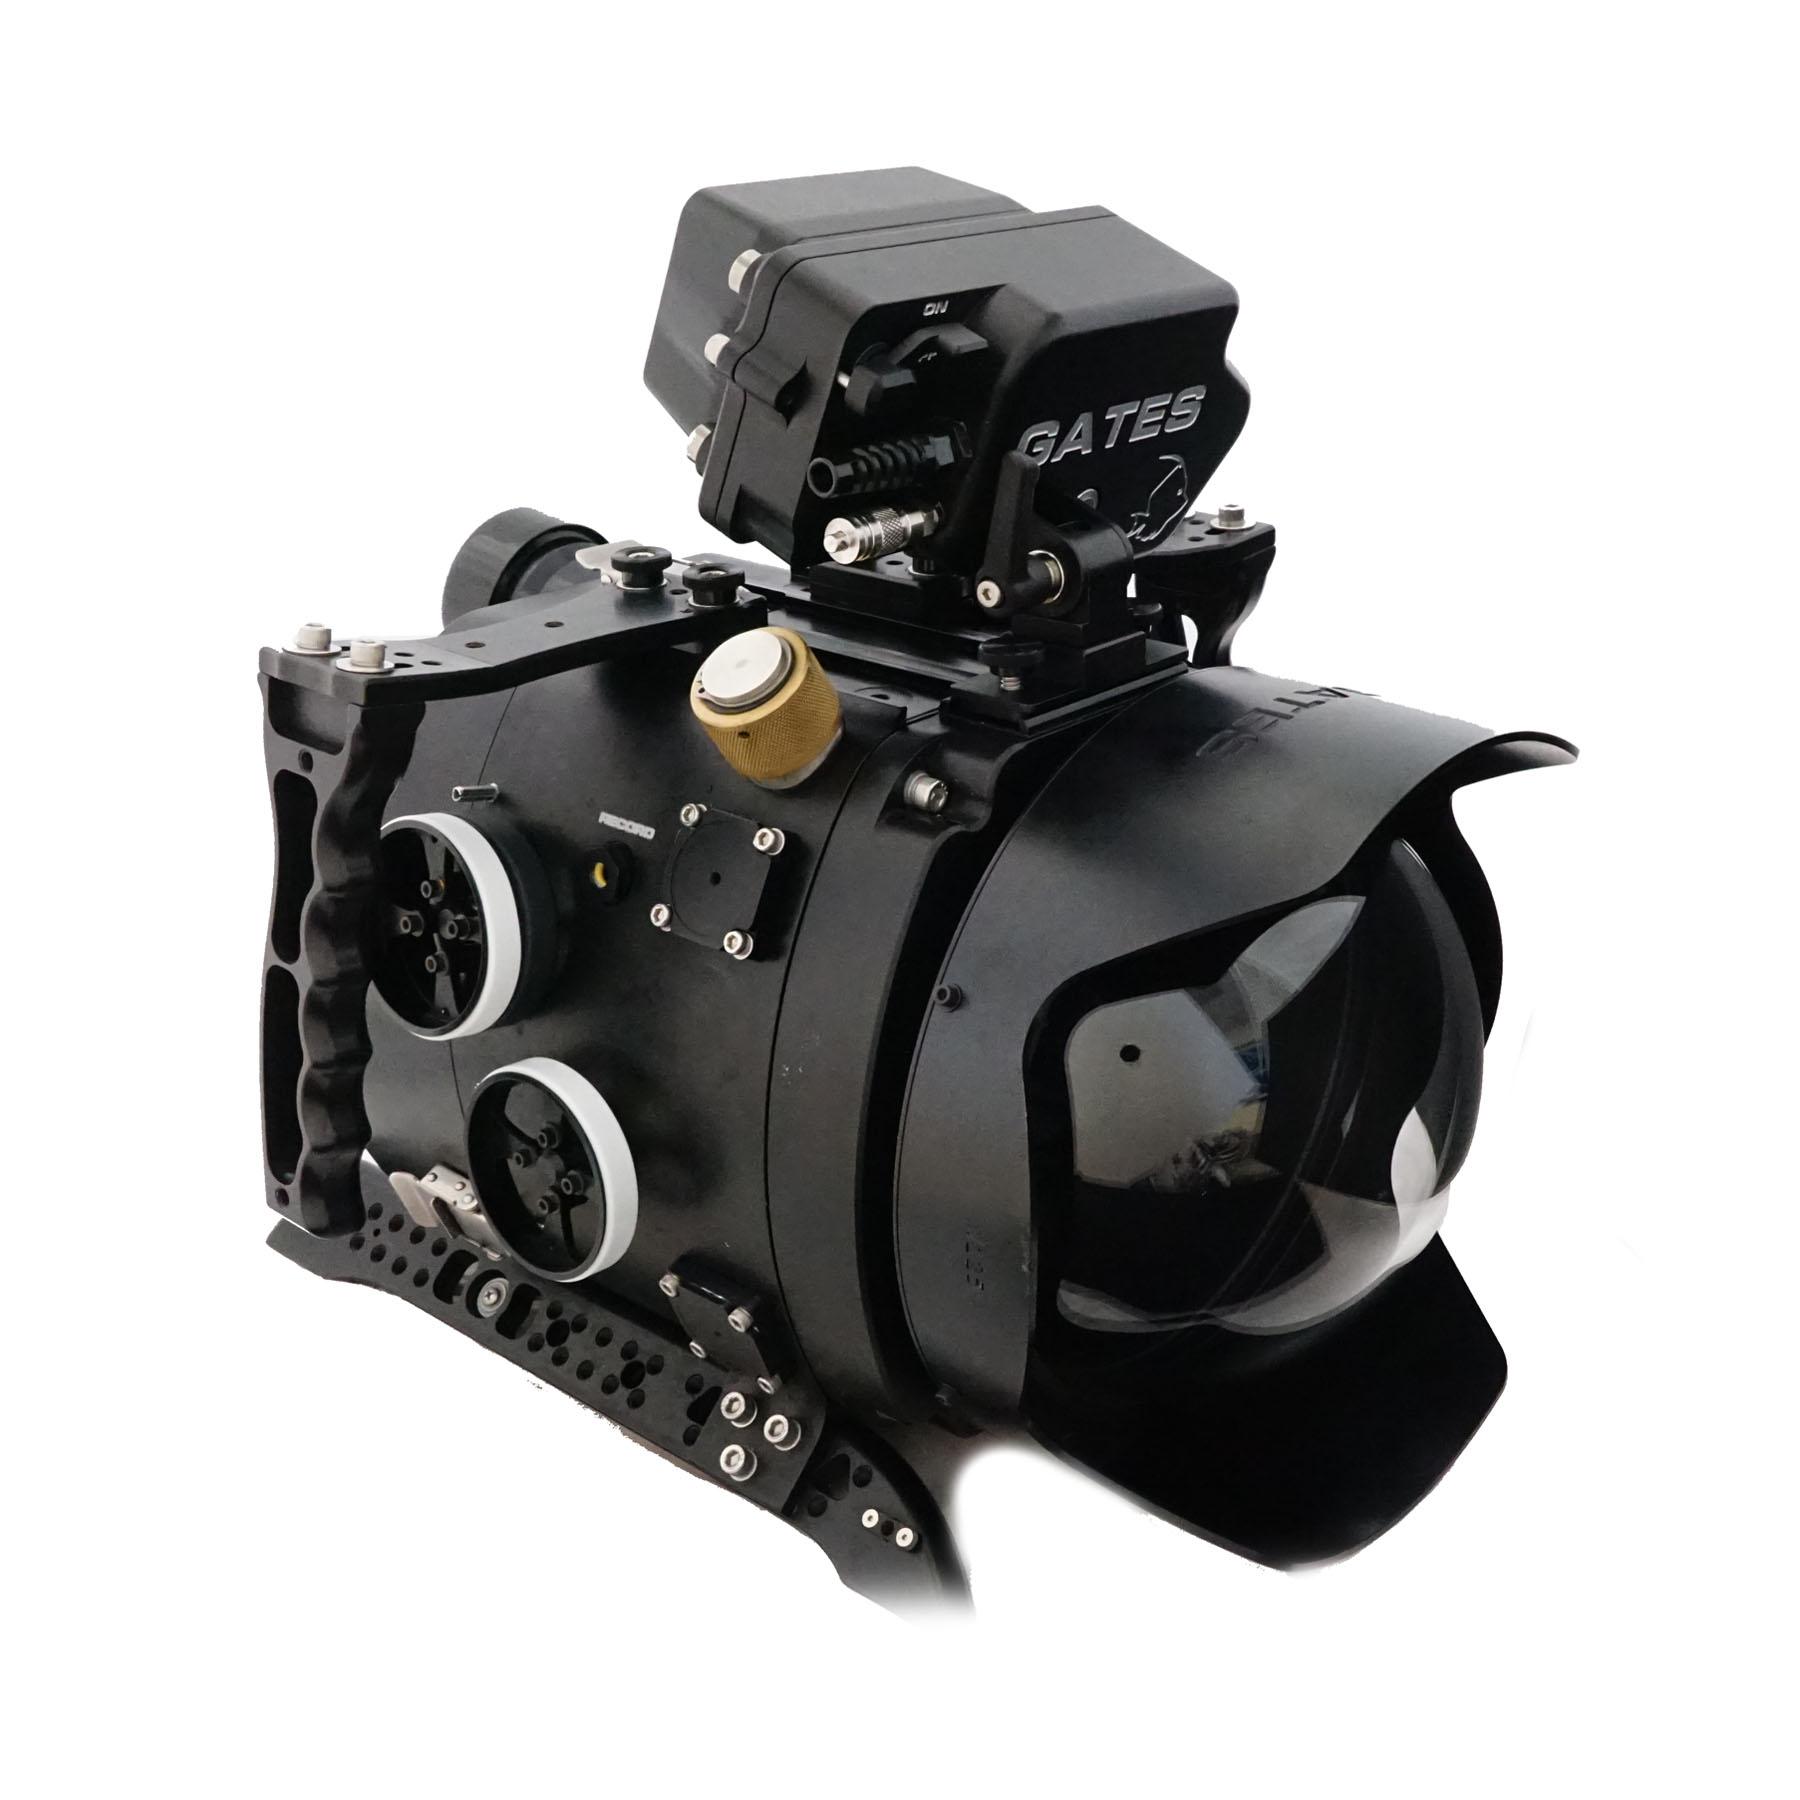 ME20 RF 6Wx300dpi